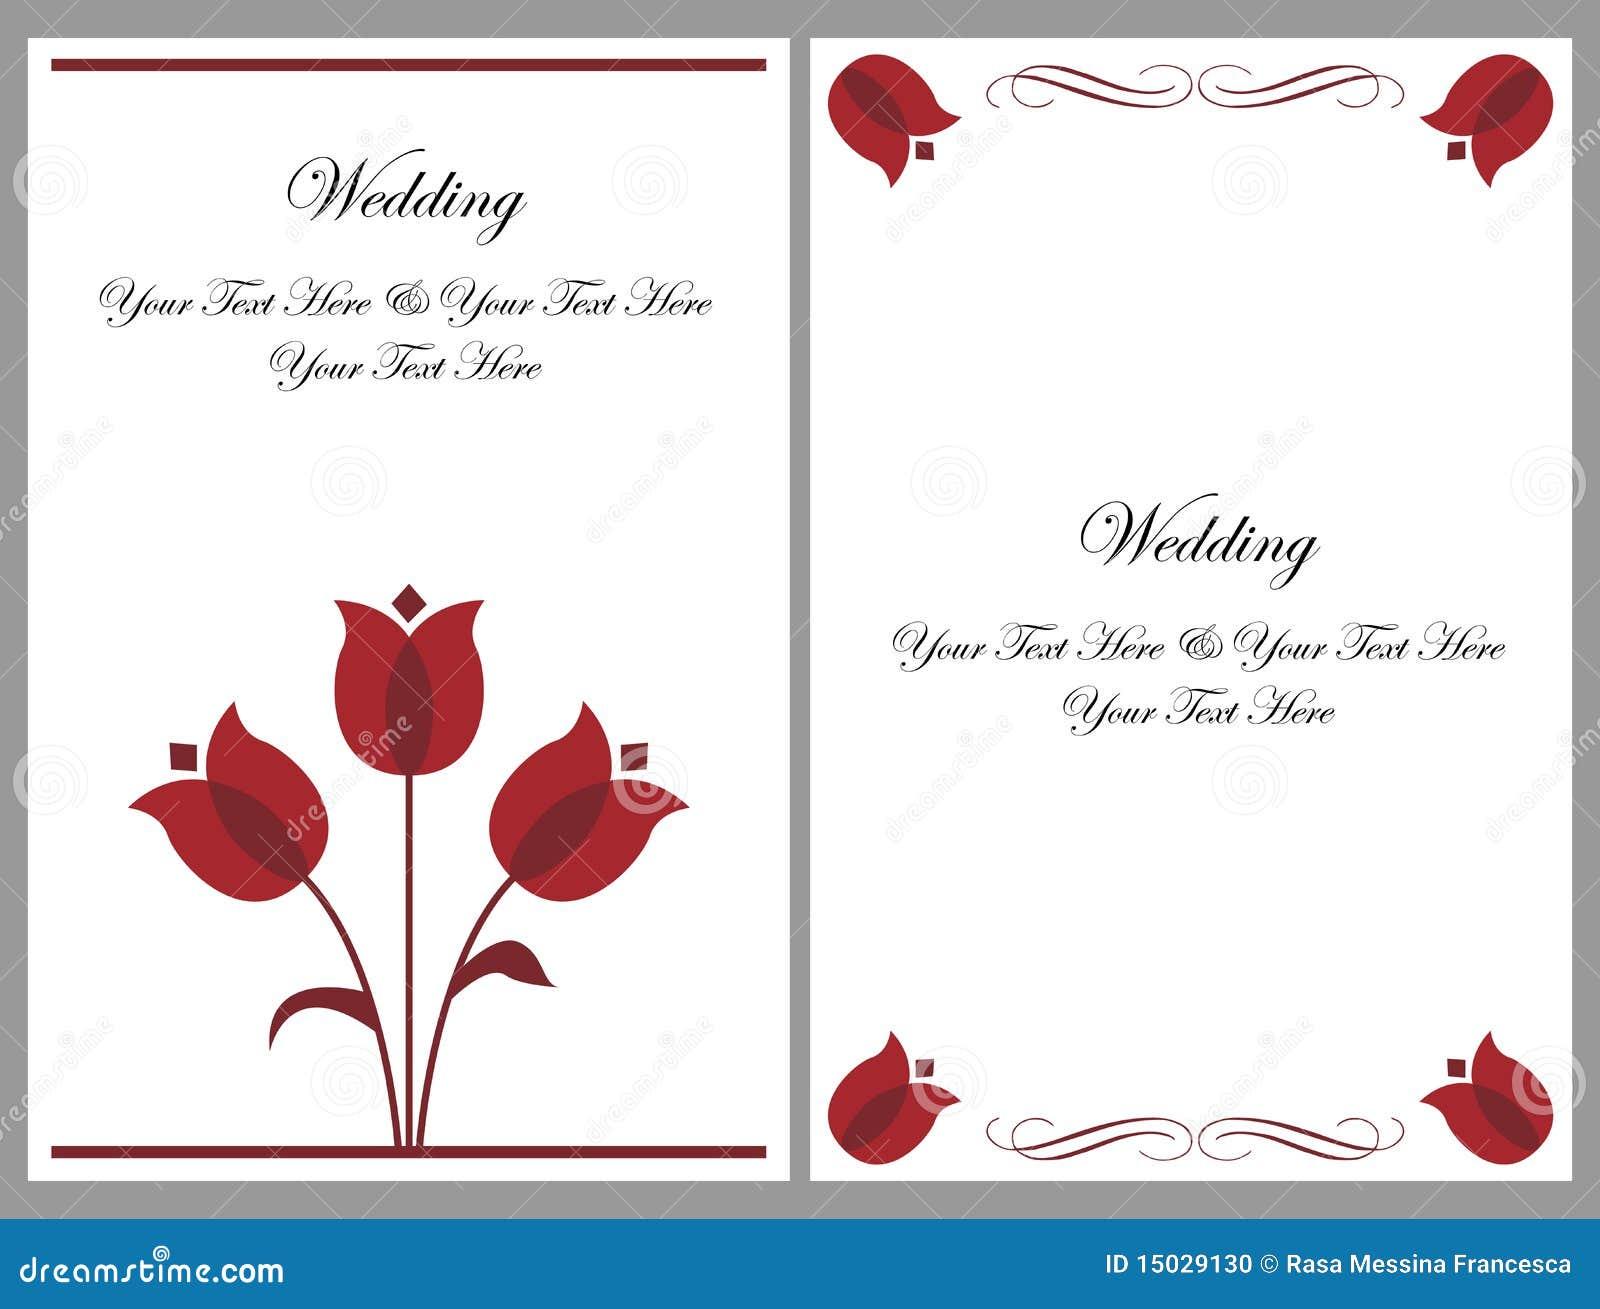 Bible Verses On Wedding Invitations for luxury invitations example